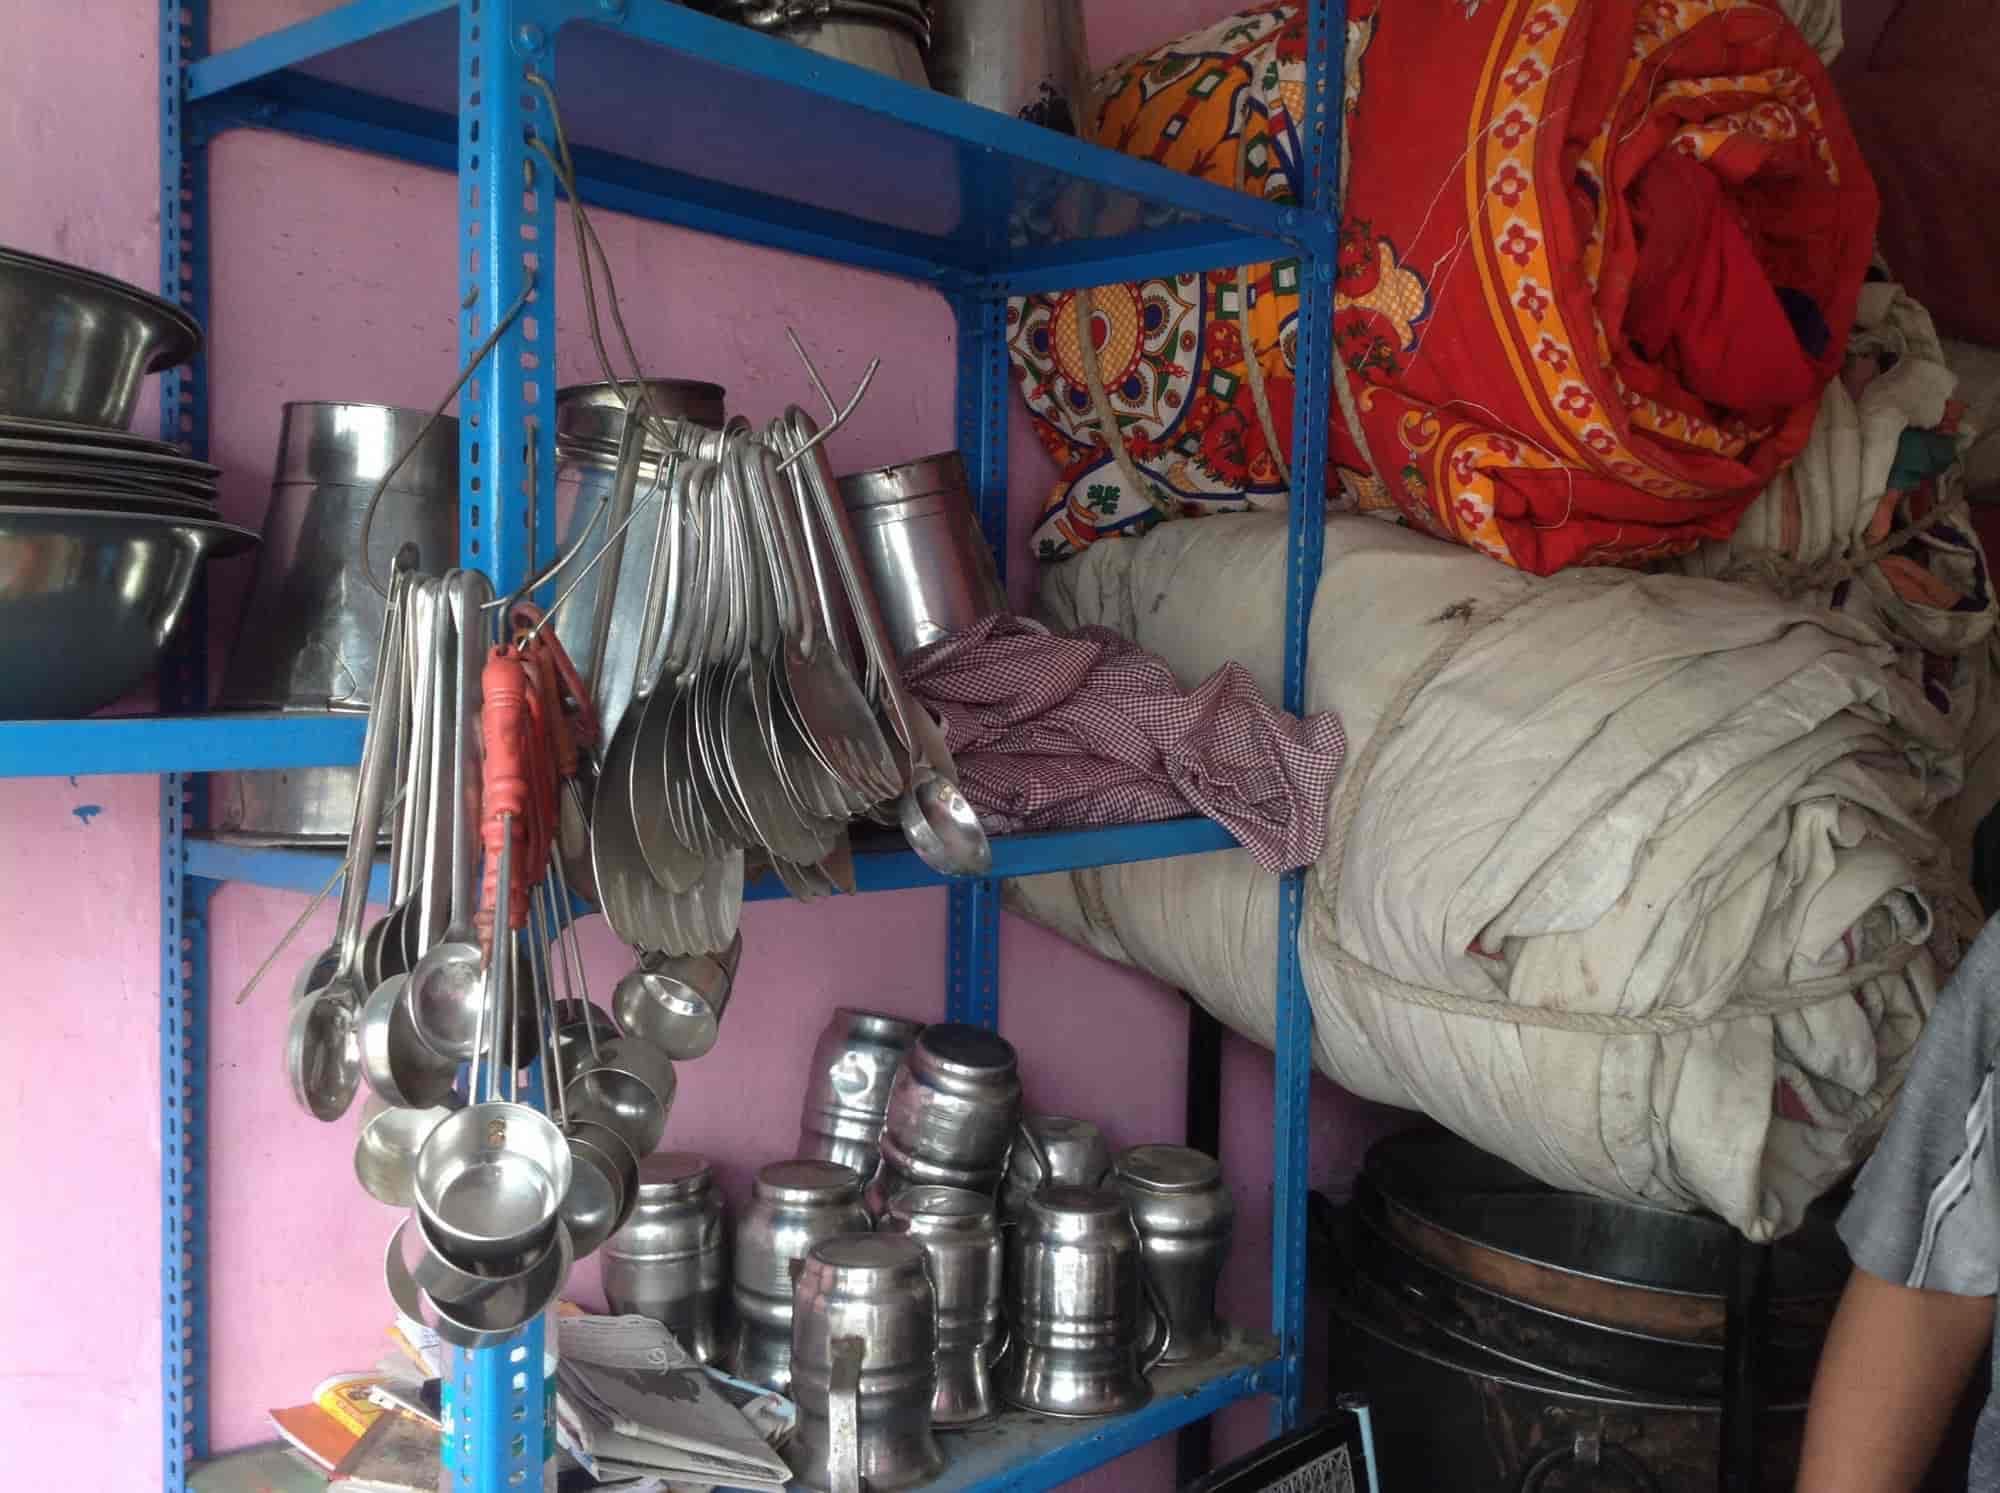 ... Tent House Item - Sri Rama Tent House Photos Mirjalguda-Malkajgiri Hyderabad ... & Sri Rama Tent House Photos Mirjalguda Malkajgiri Hyderabad ...